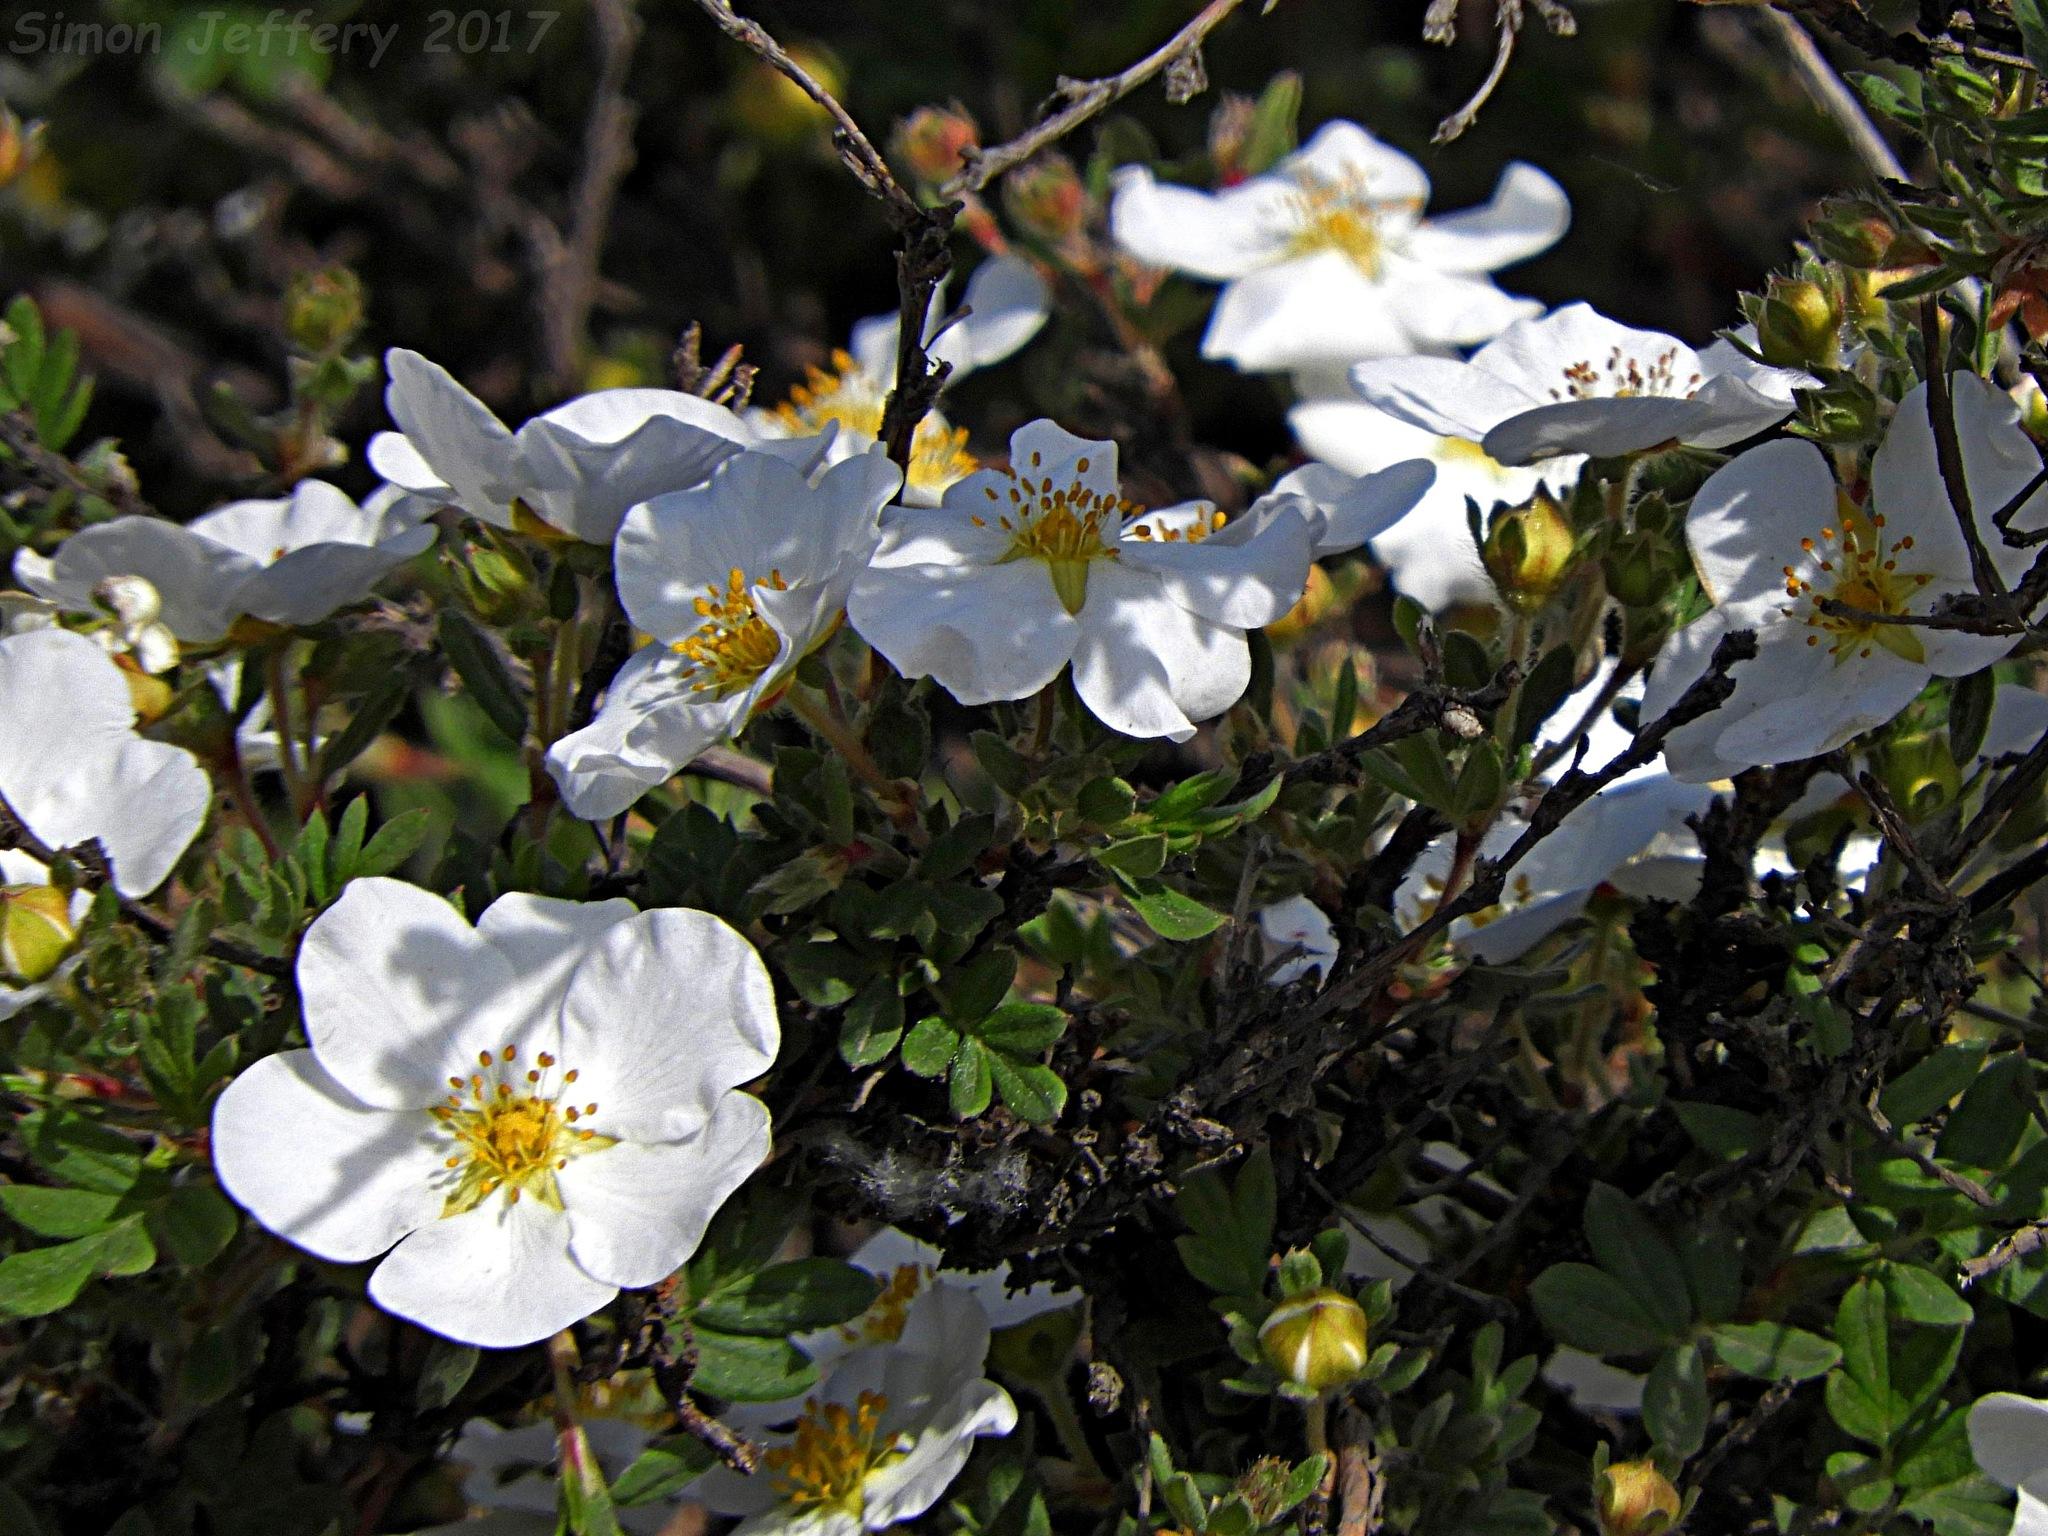 White flowers by Simon Jeffery